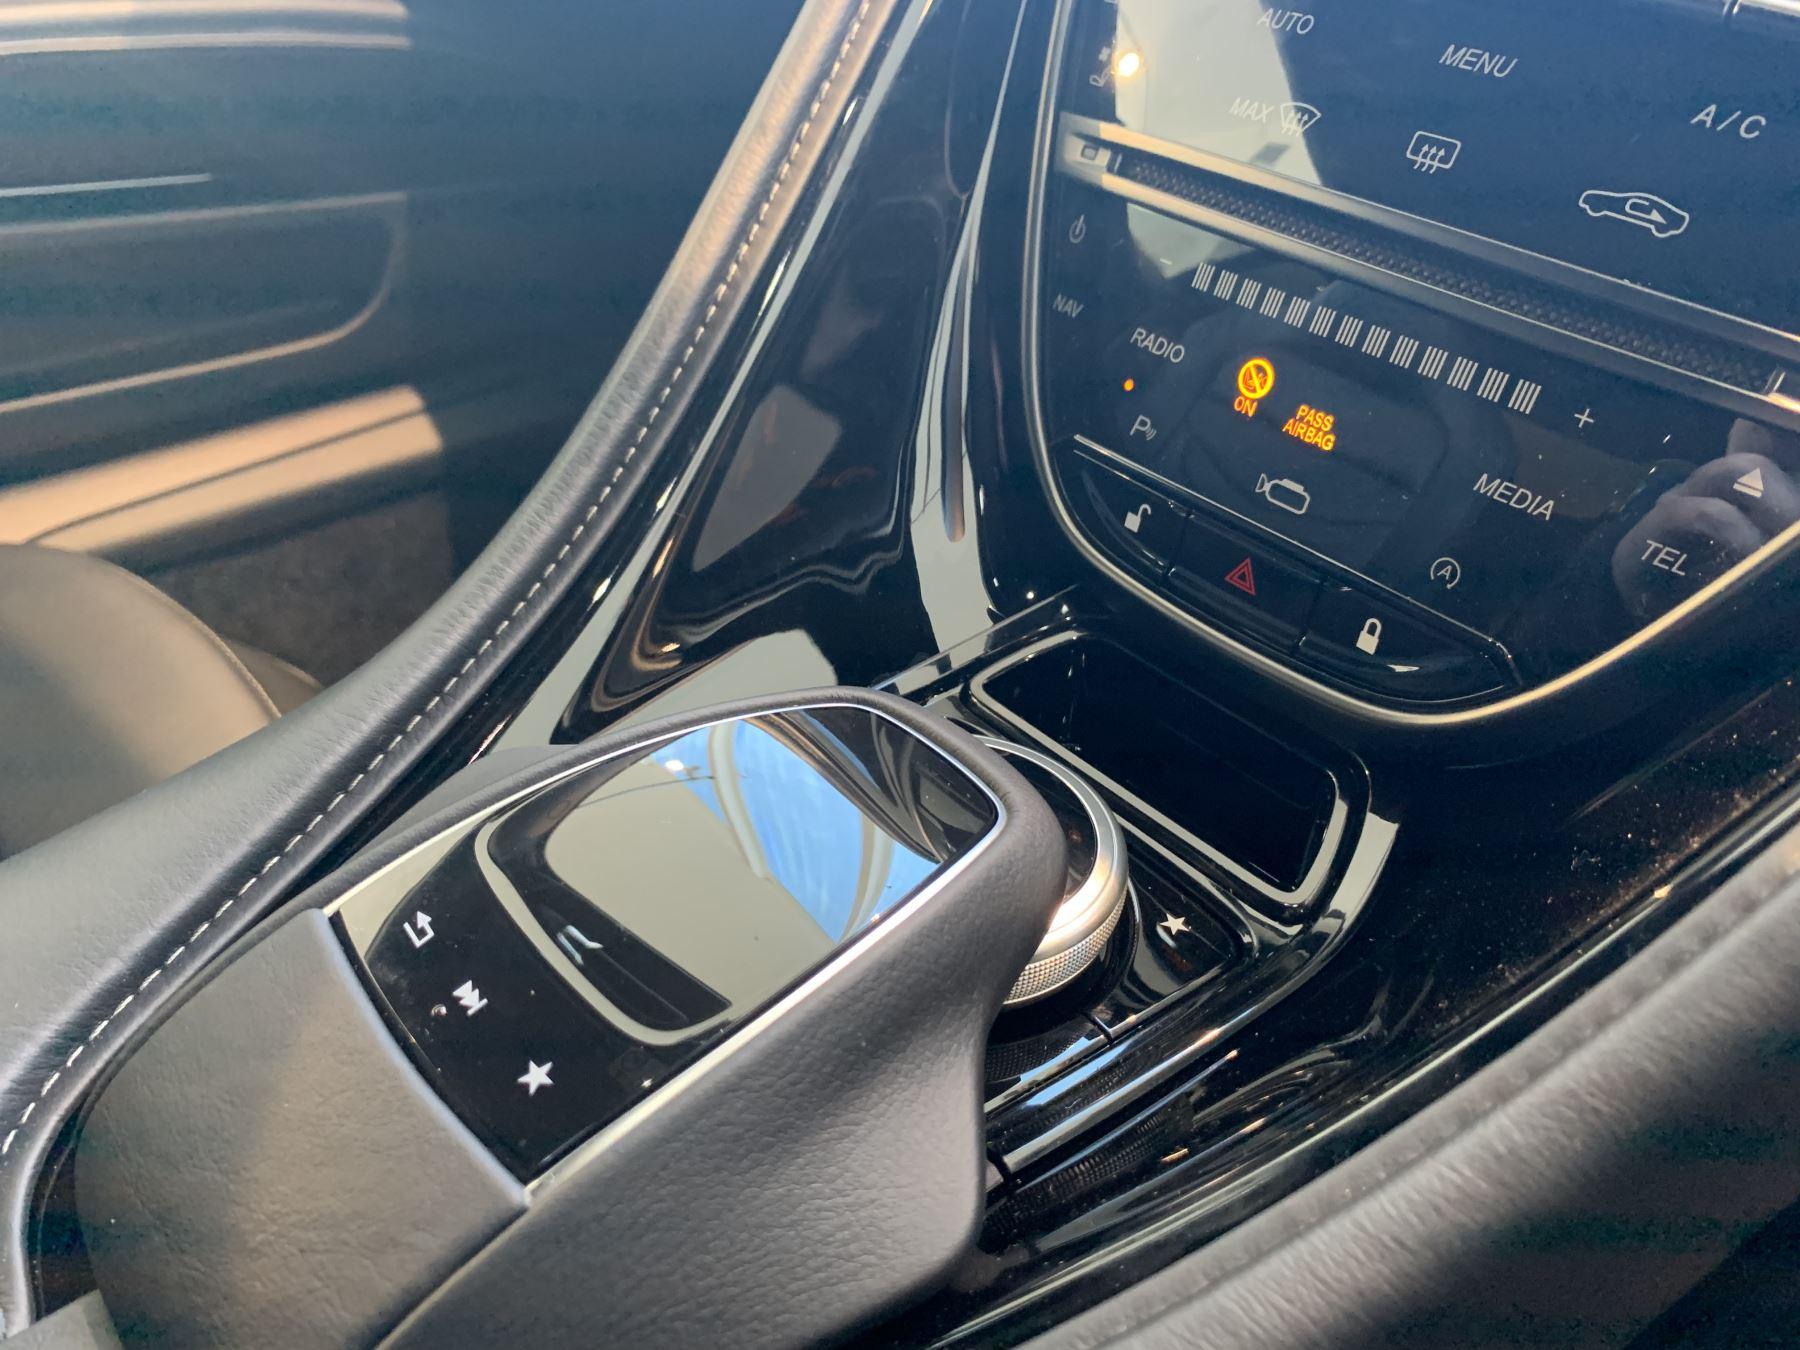 Aston Martin DBS Superleggera V12 Superleggera 2dr Touchtronic Auto image 12